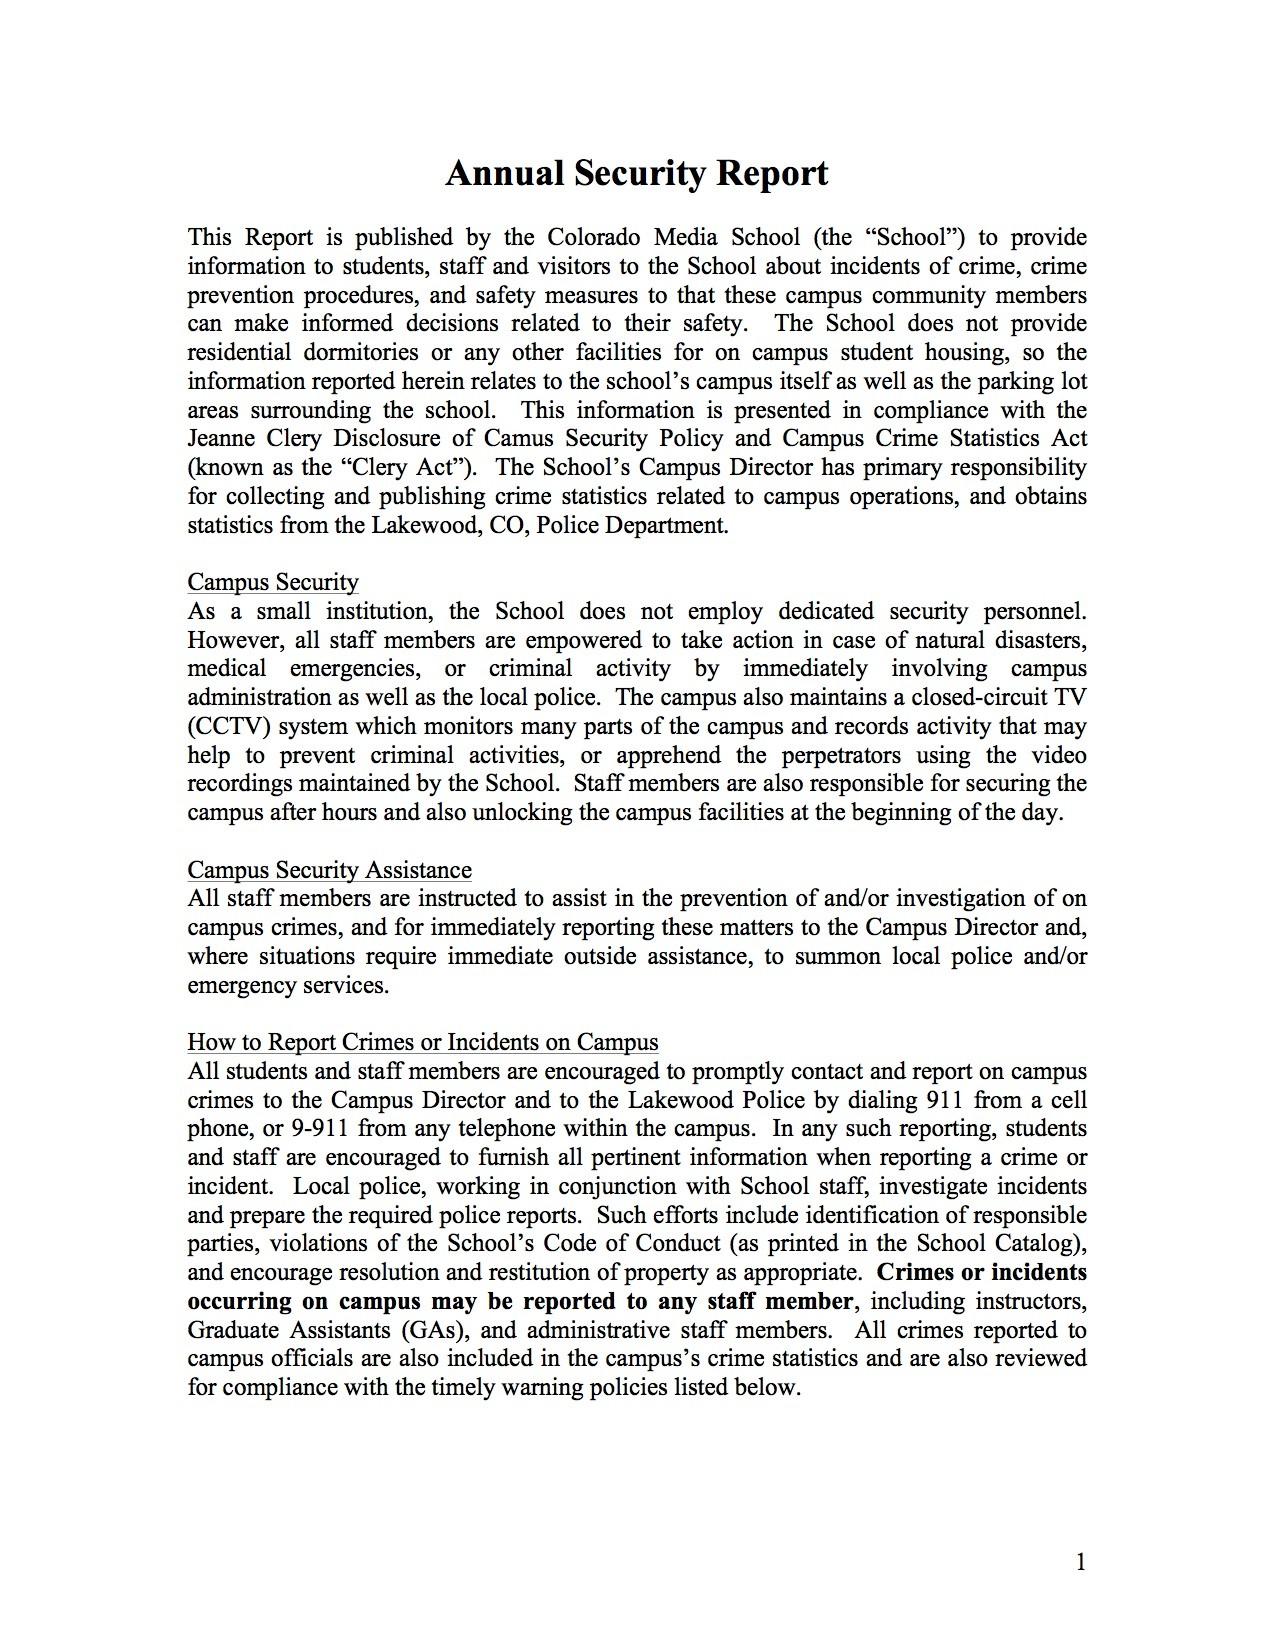 Annual-Security-Report-2014-Colorado